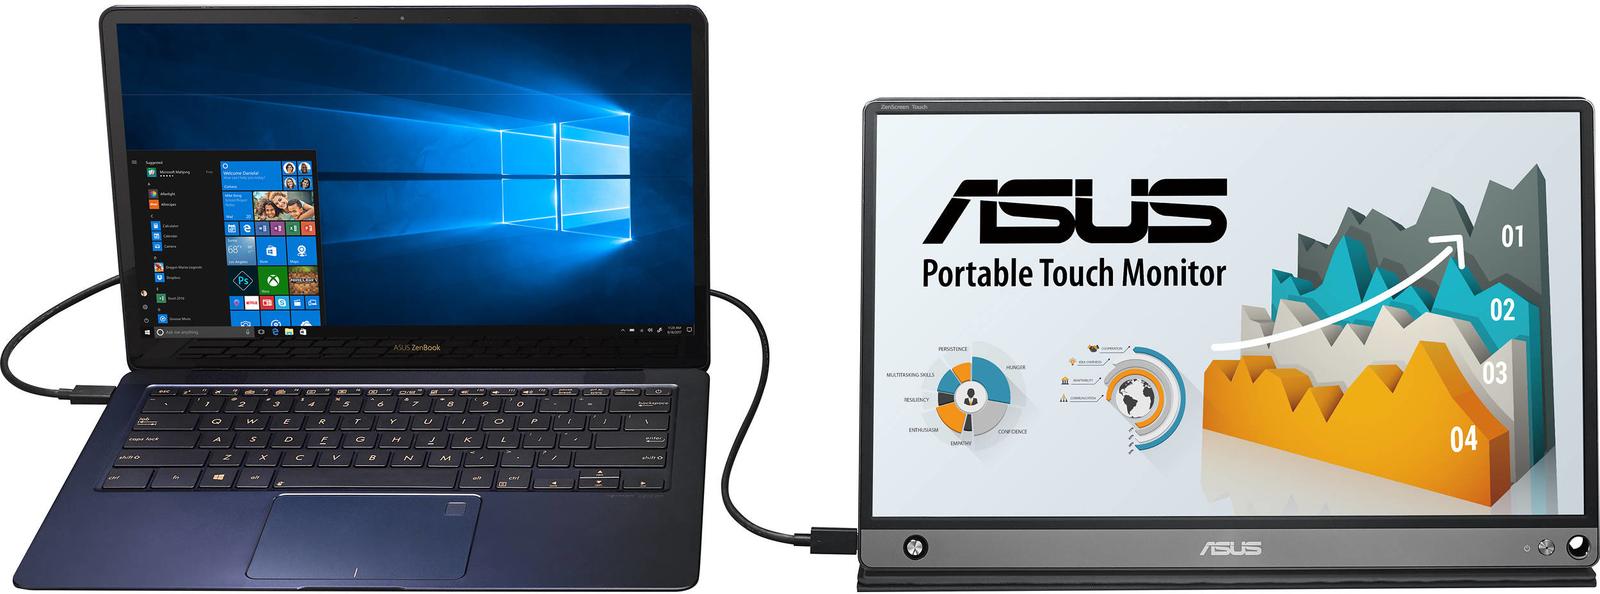 "15.6"" ASUS ZenScreen Touchscreen USB Monitor image"